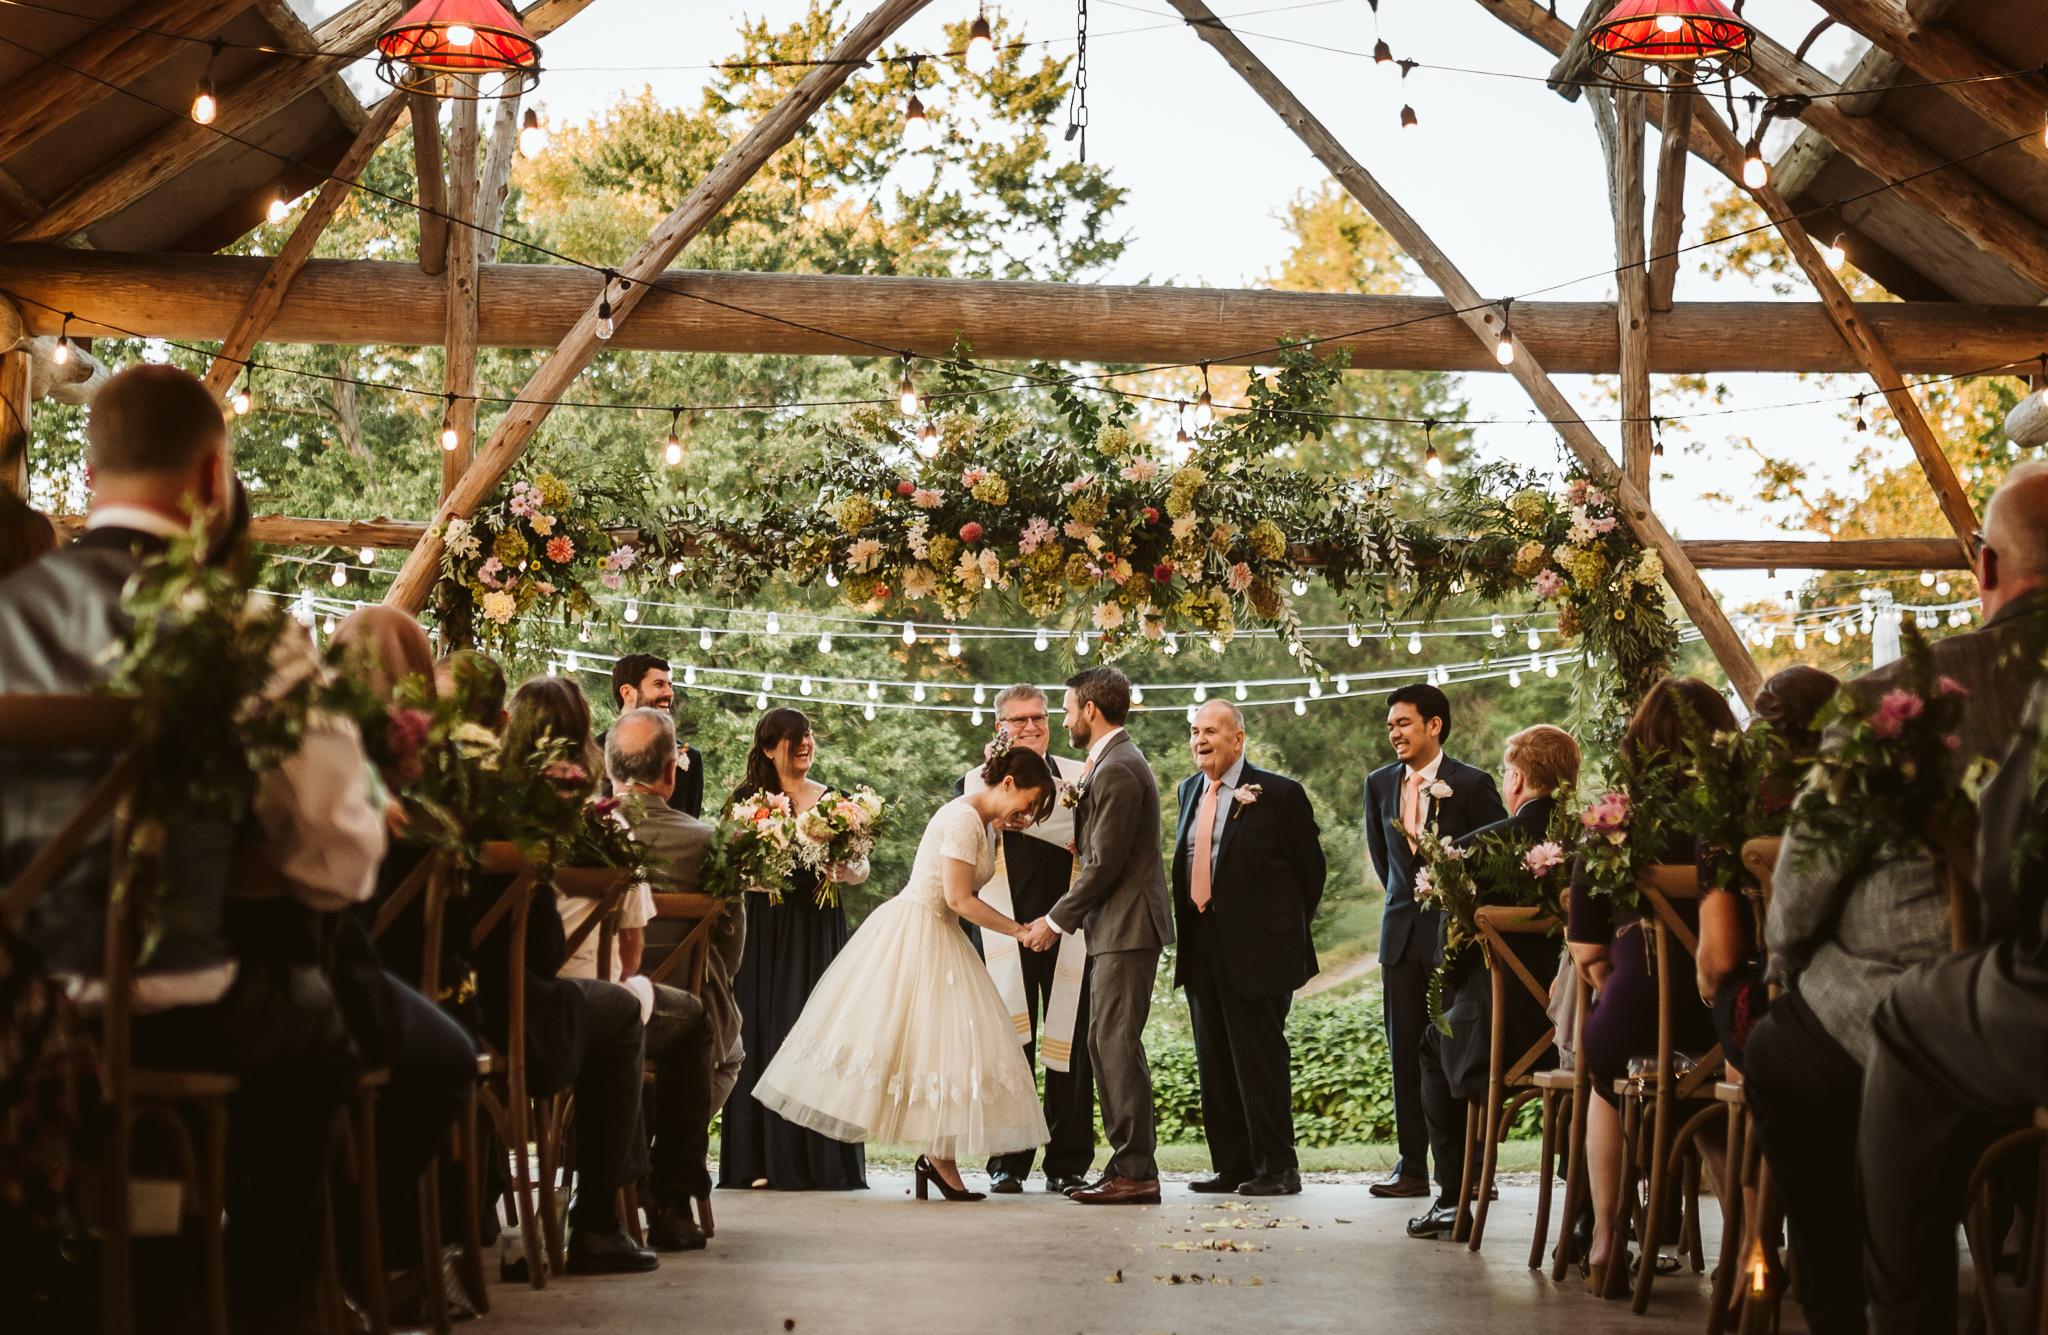 Wollam_gardens_wedding52.JPG